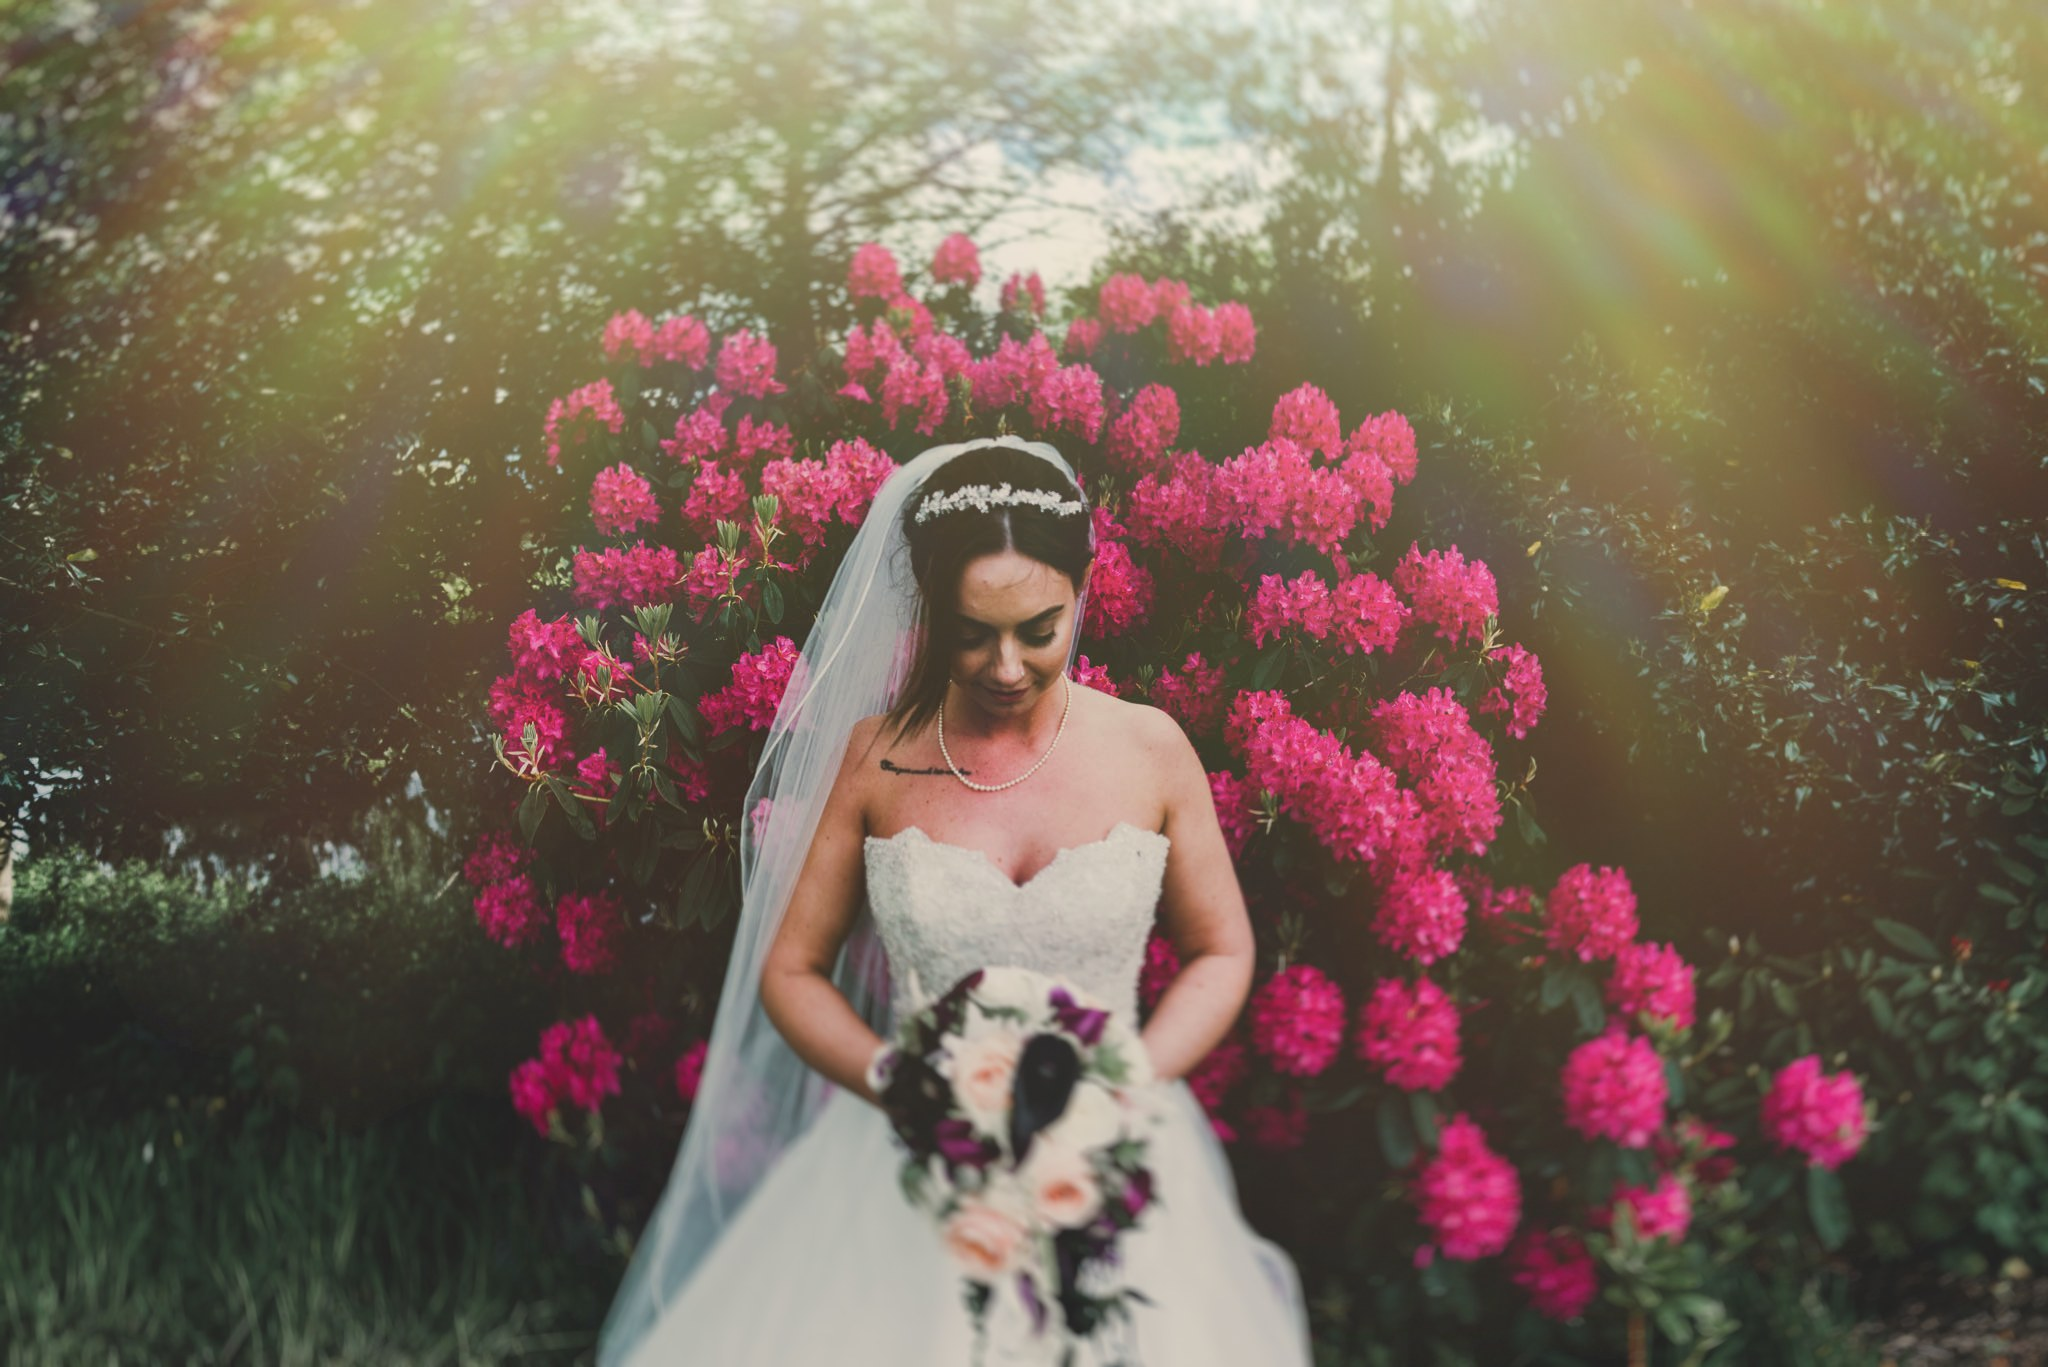 Alternative-wedding-photography-in-manchester-jade-maguire-photograhy (19).jpg